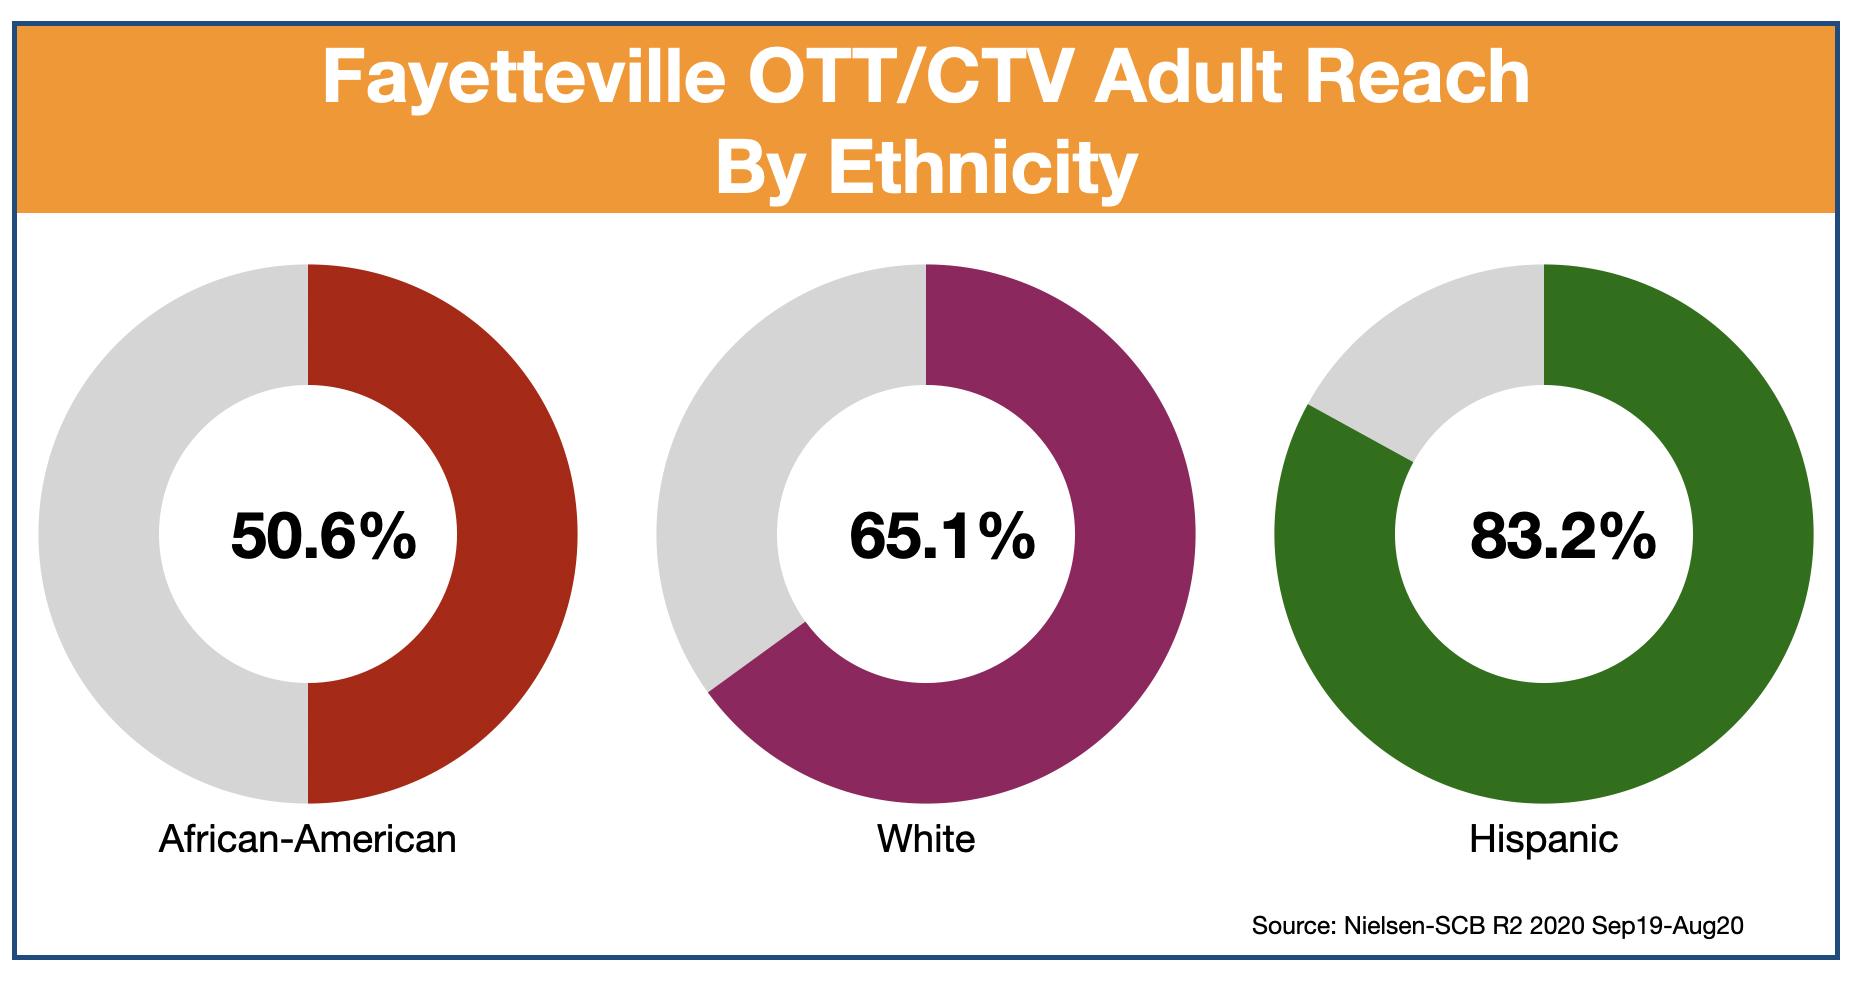 OTT & CTV advertising in Fayetteville Ethnic